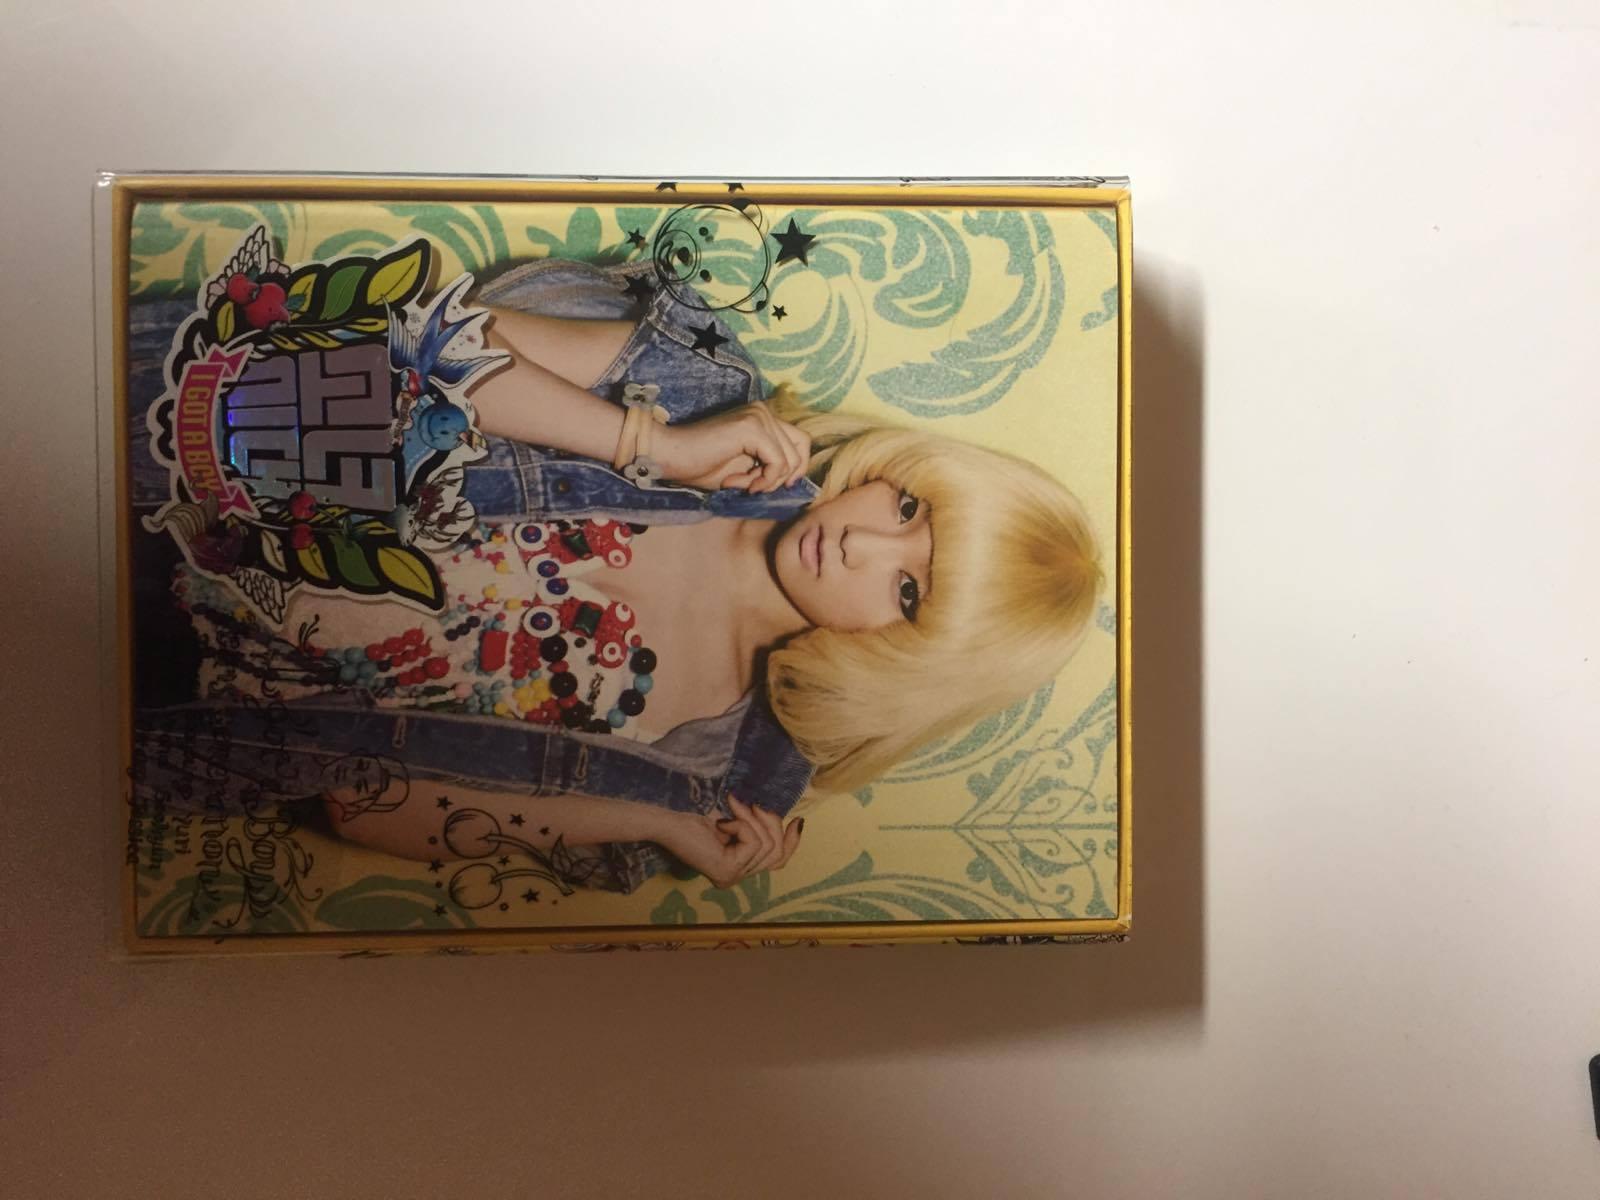 SNSD - I Got a Boy Album (Taeyeon Vers.)